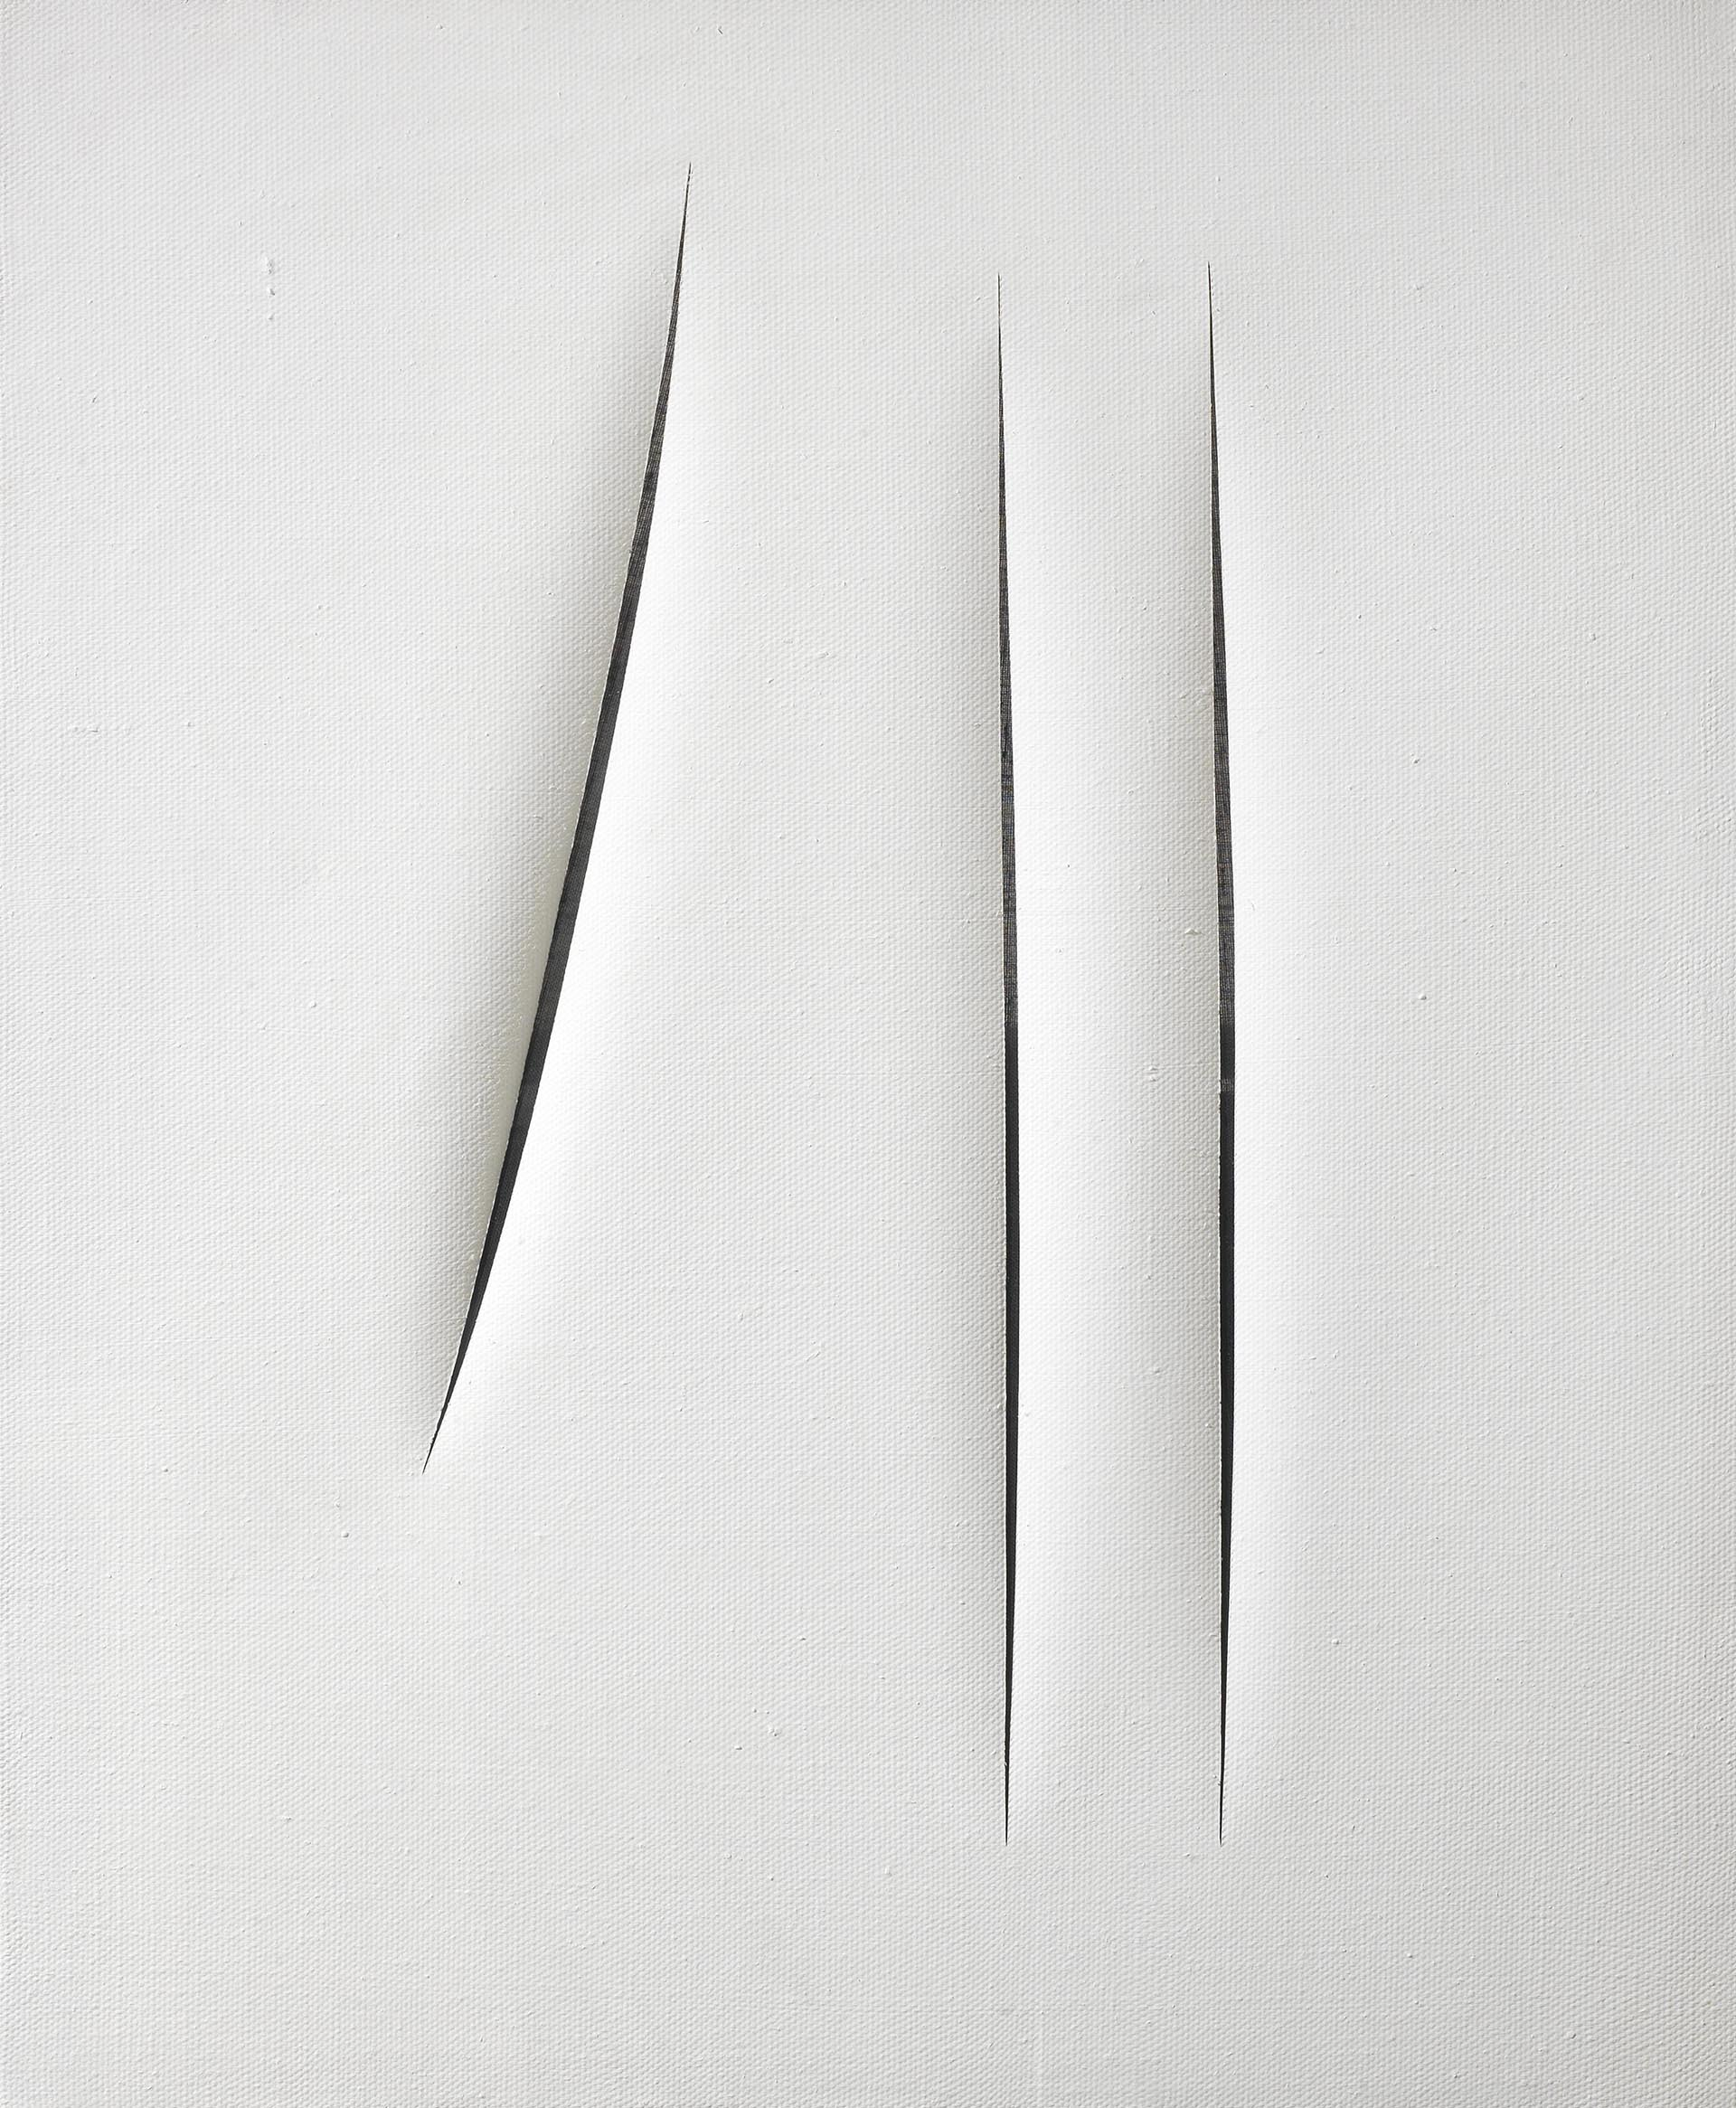 Fontana_Concetto-spaziale-Attese_1966_61x50-cm